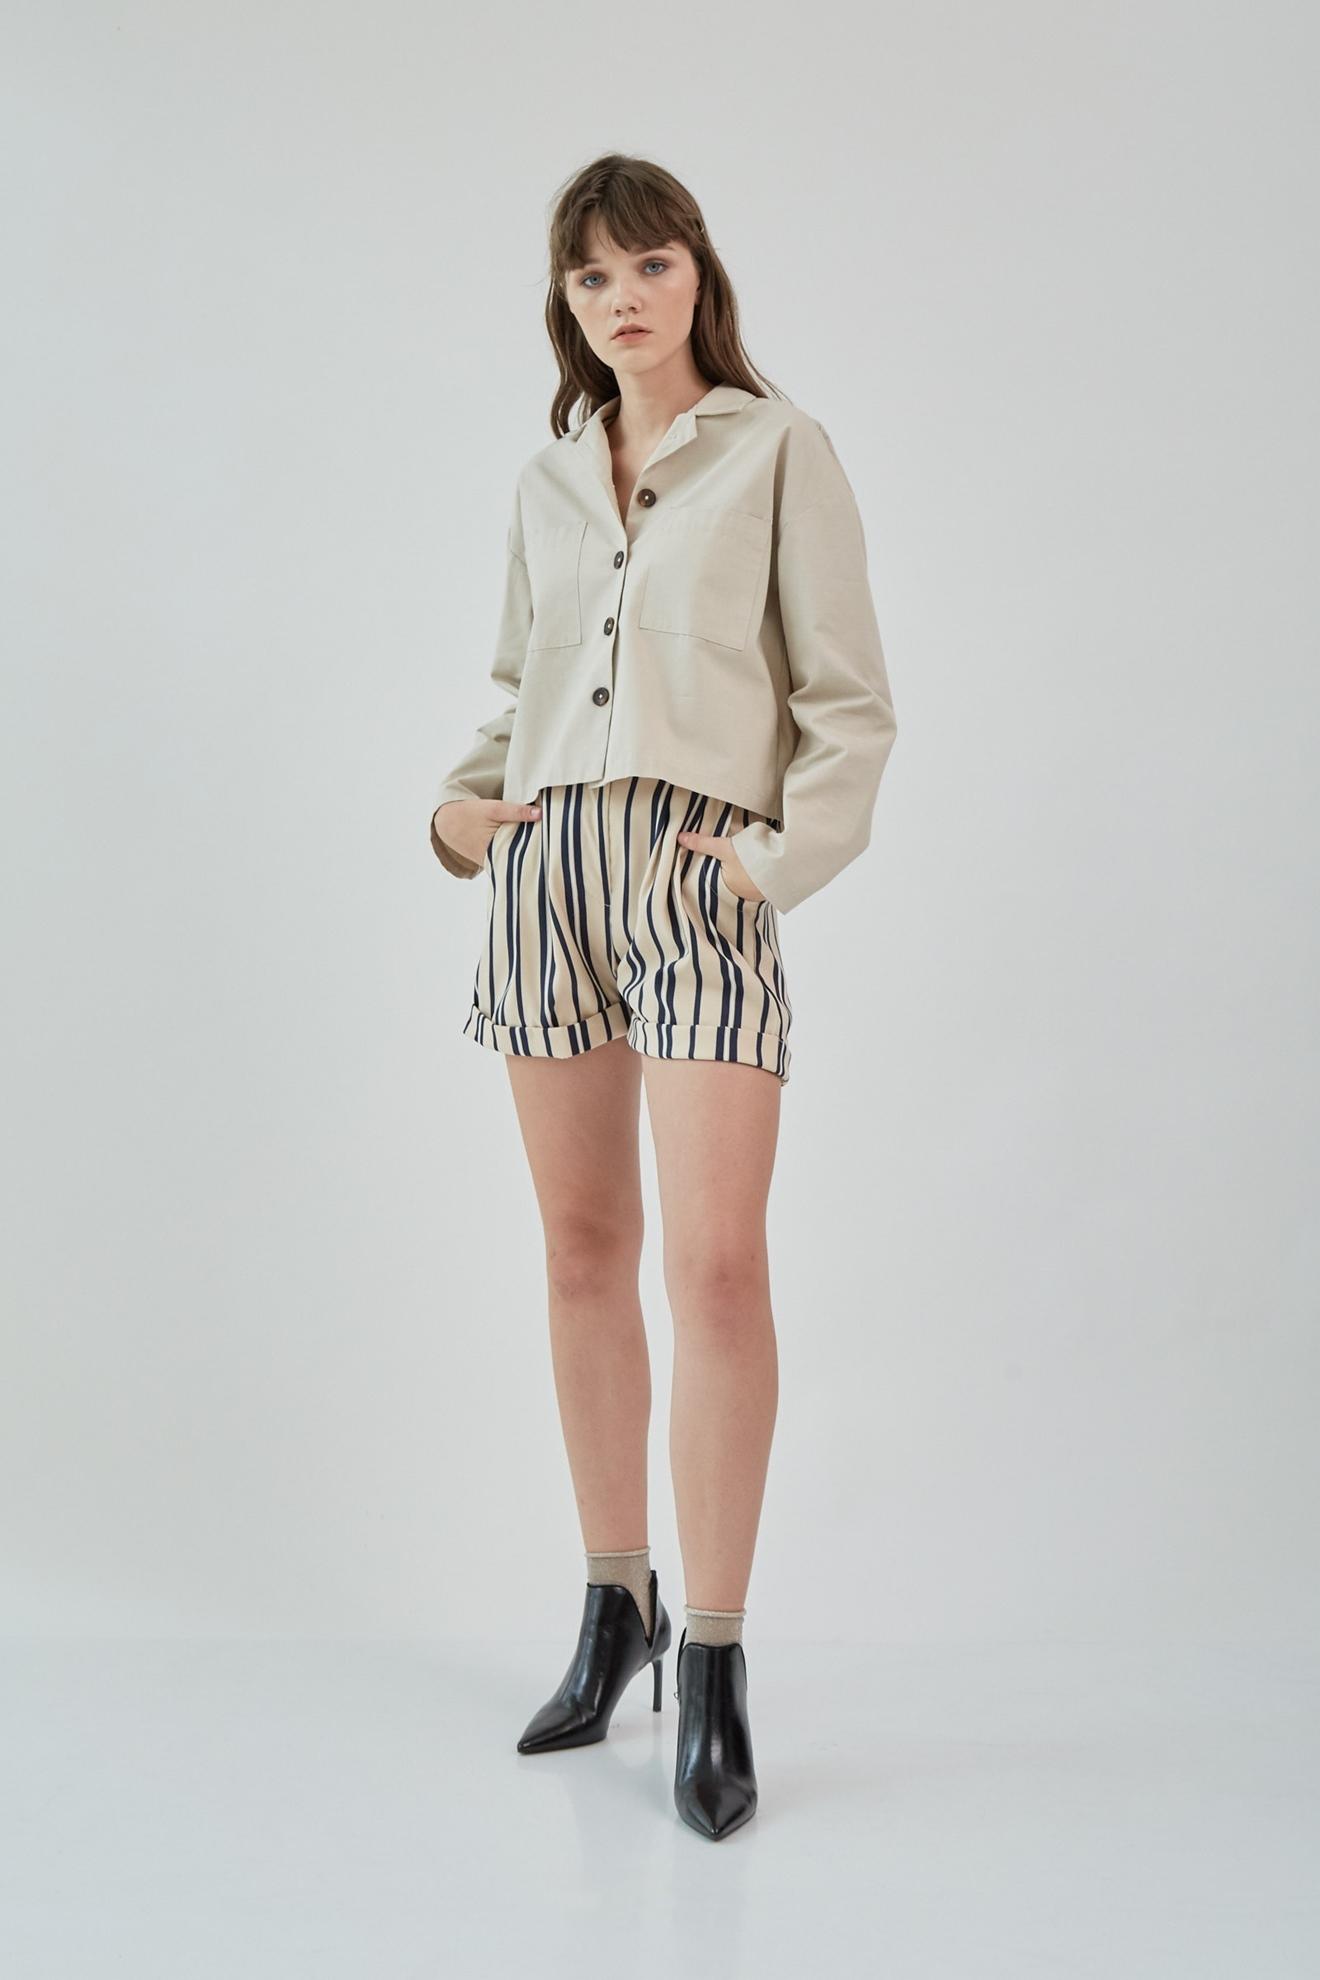 Picture of Mateo Shirt Jacket Cream